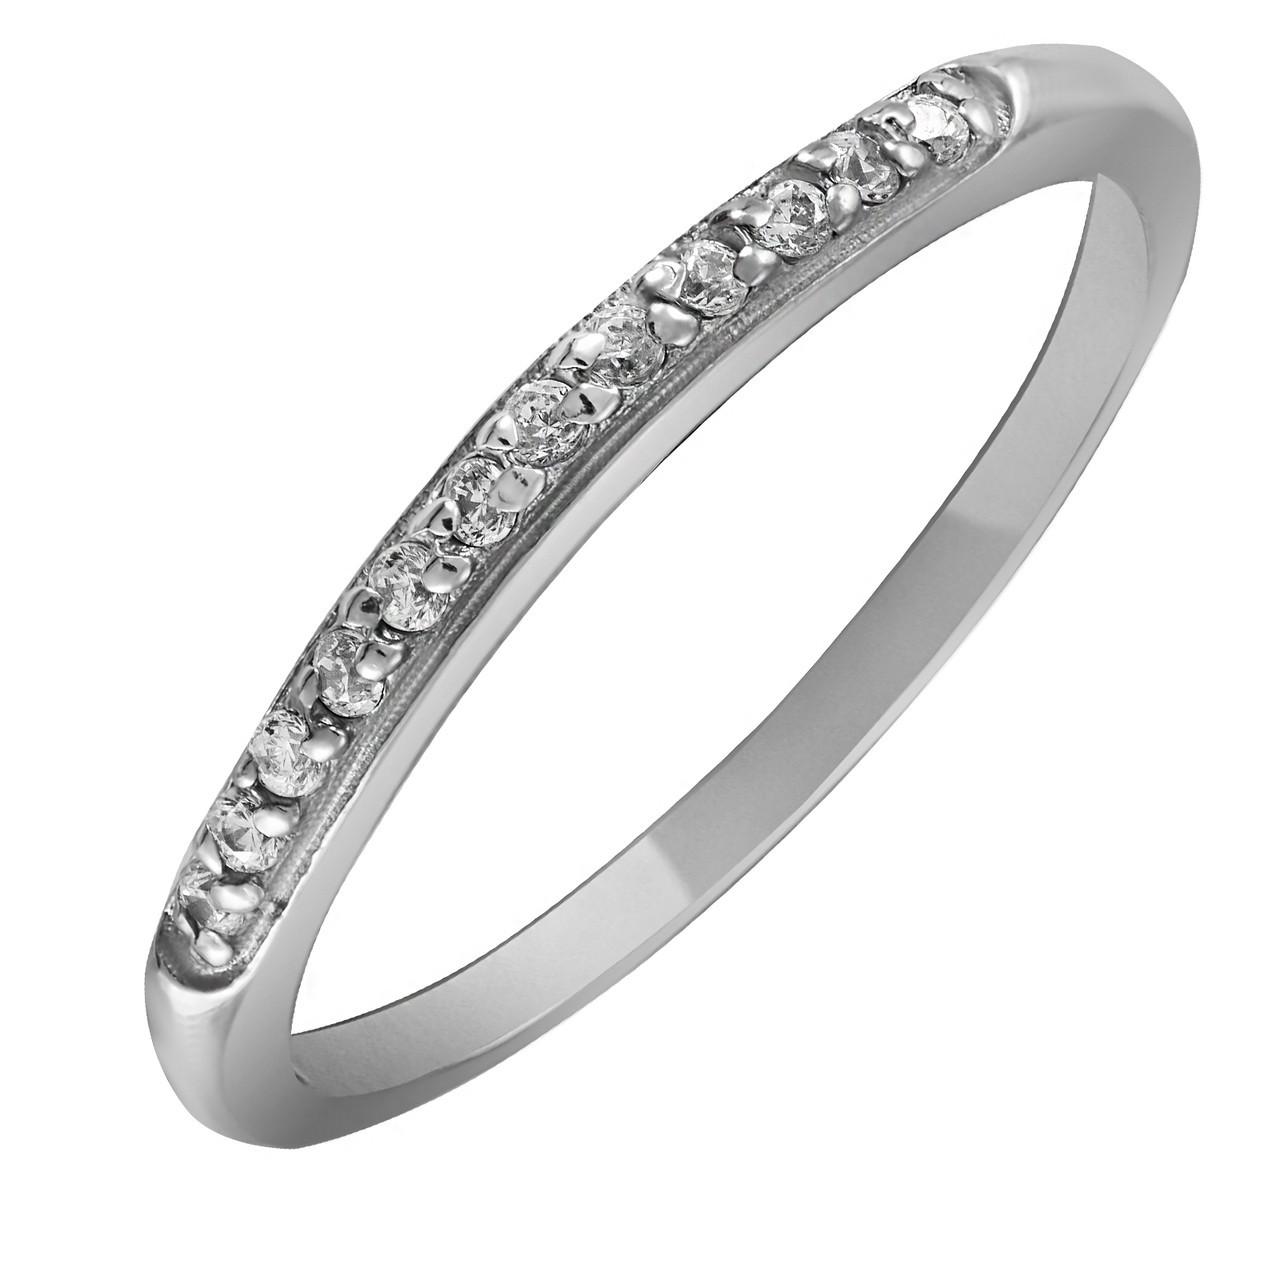 Кольцо из серебра с куб. циркониями Twiddle Jewelry 15.5 размер (К014-15.5)